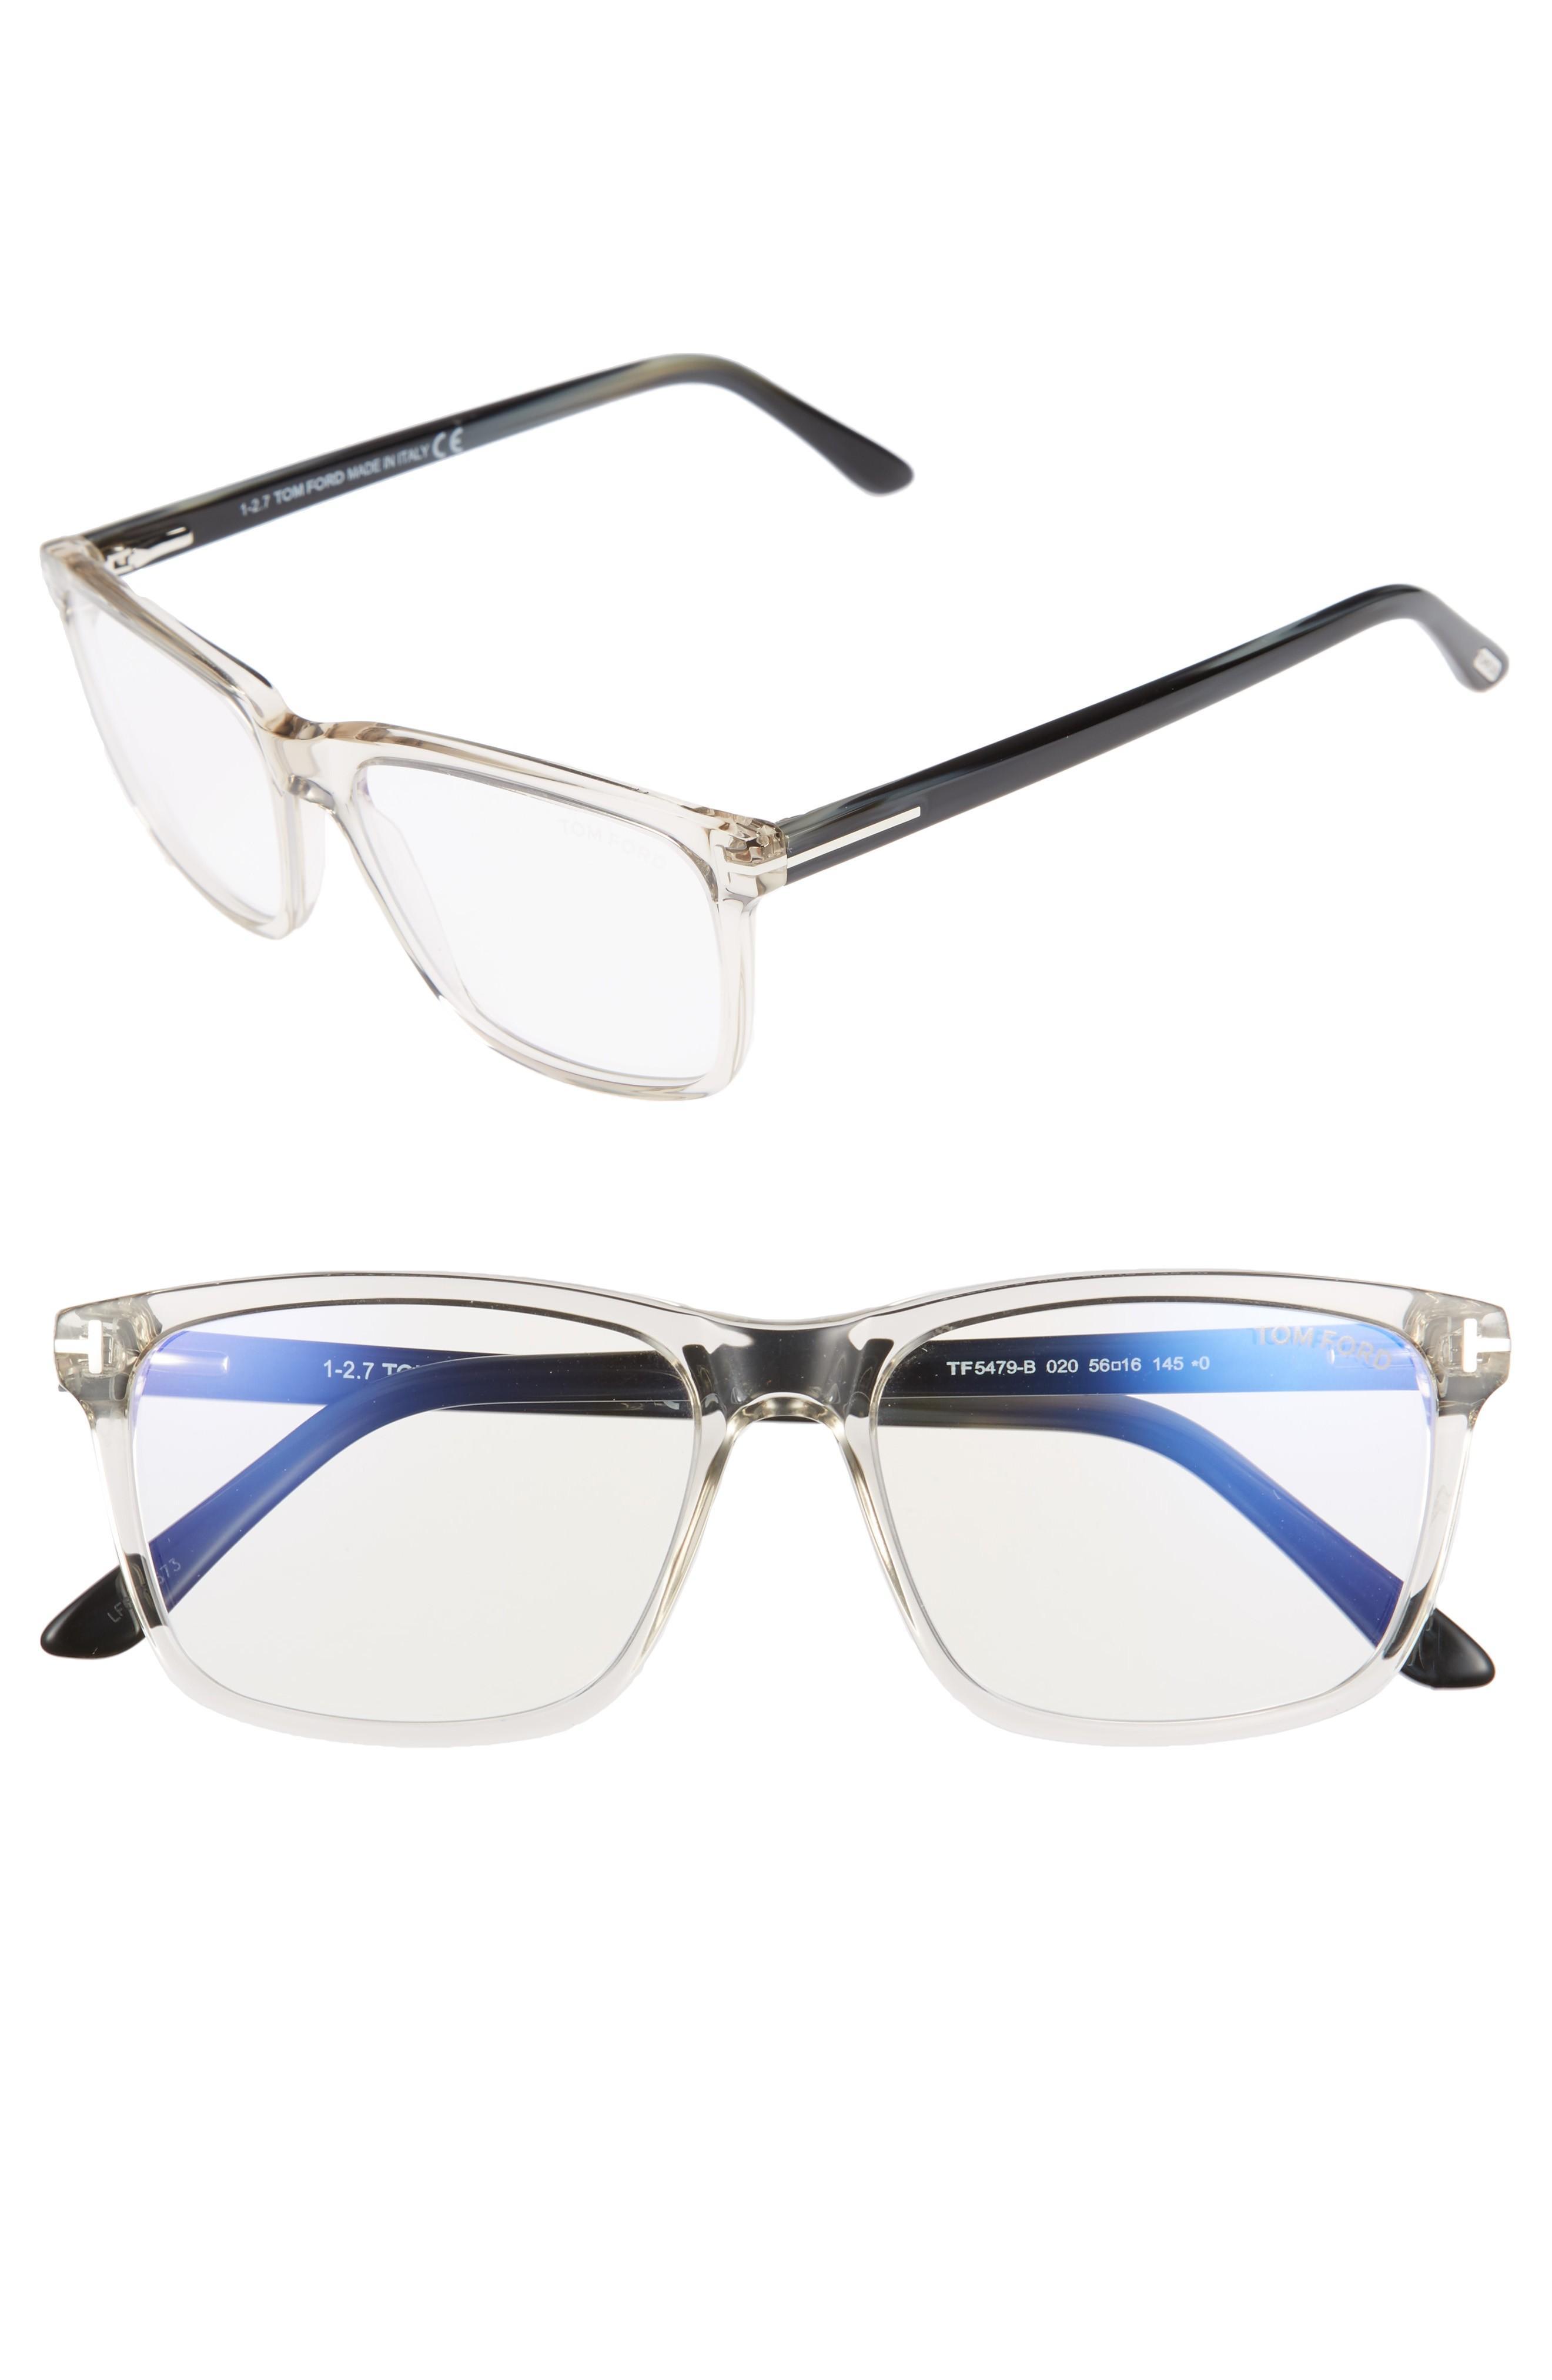 0af2aac83faa Tom Ford 56Mm Blue Block Optical Glasses - Grey  Striped Blue